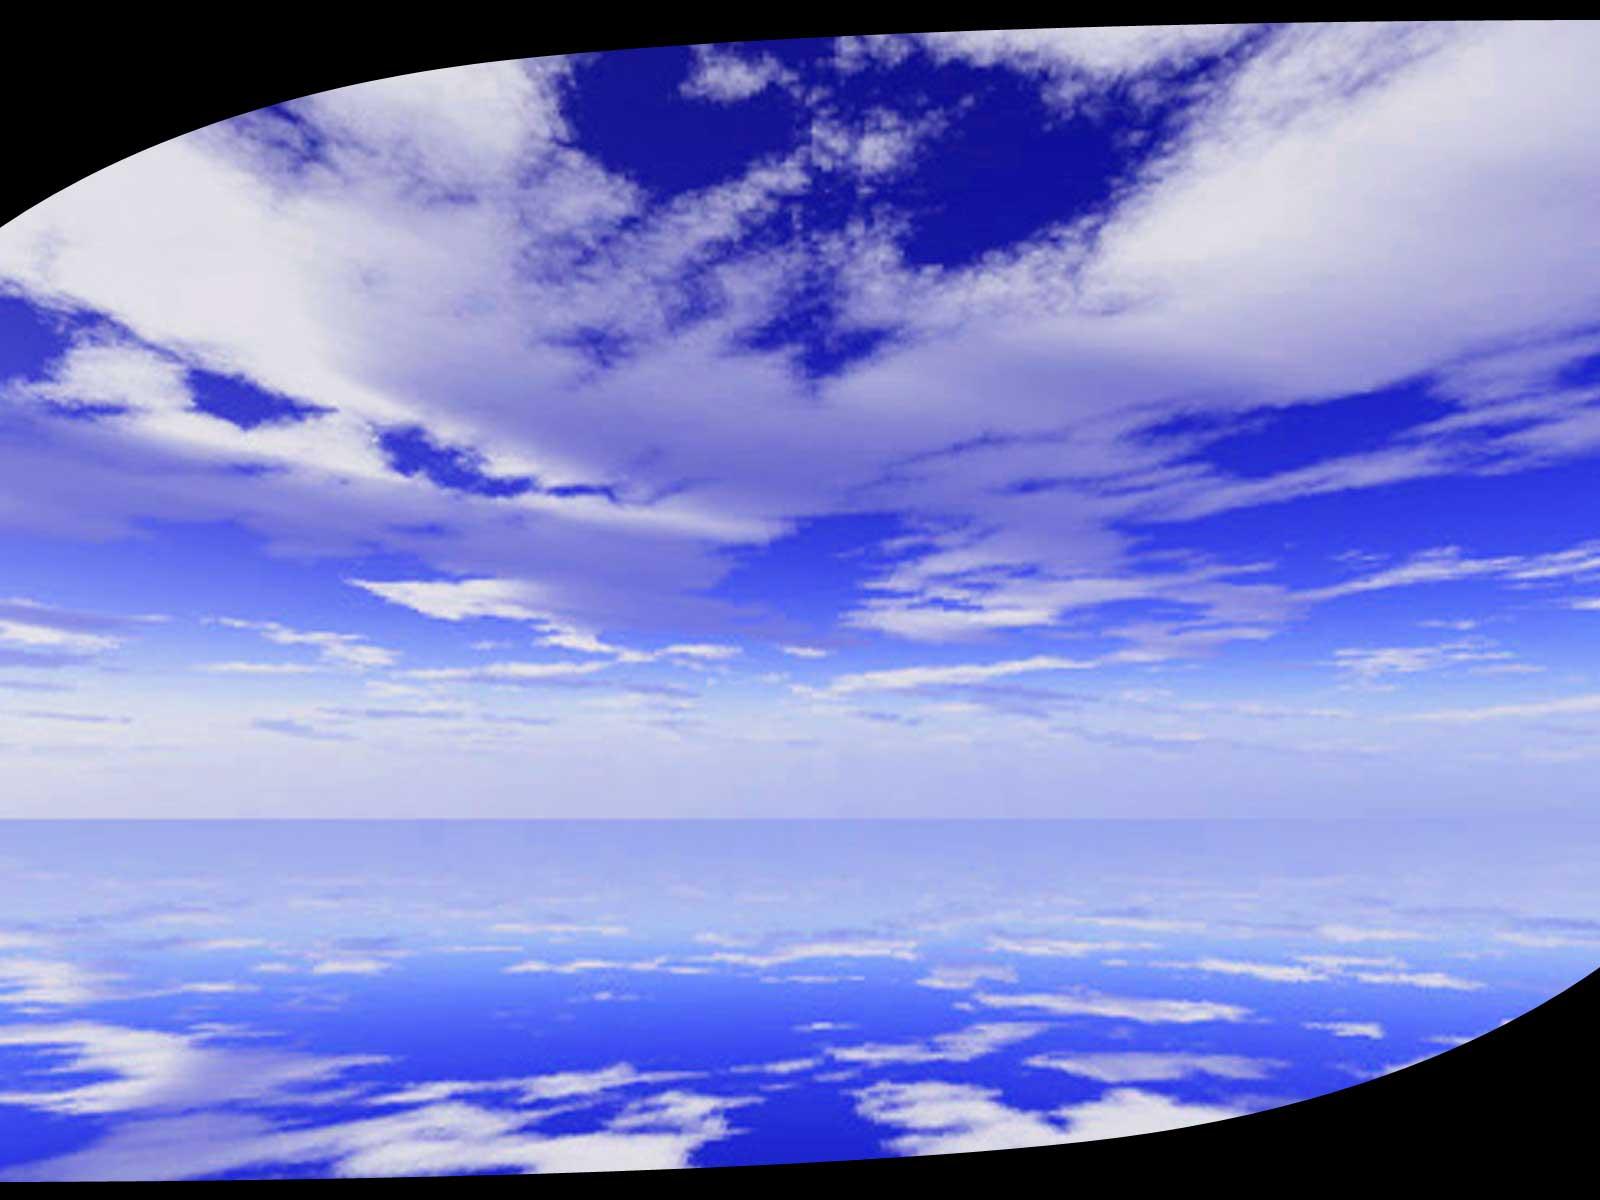 sky-view